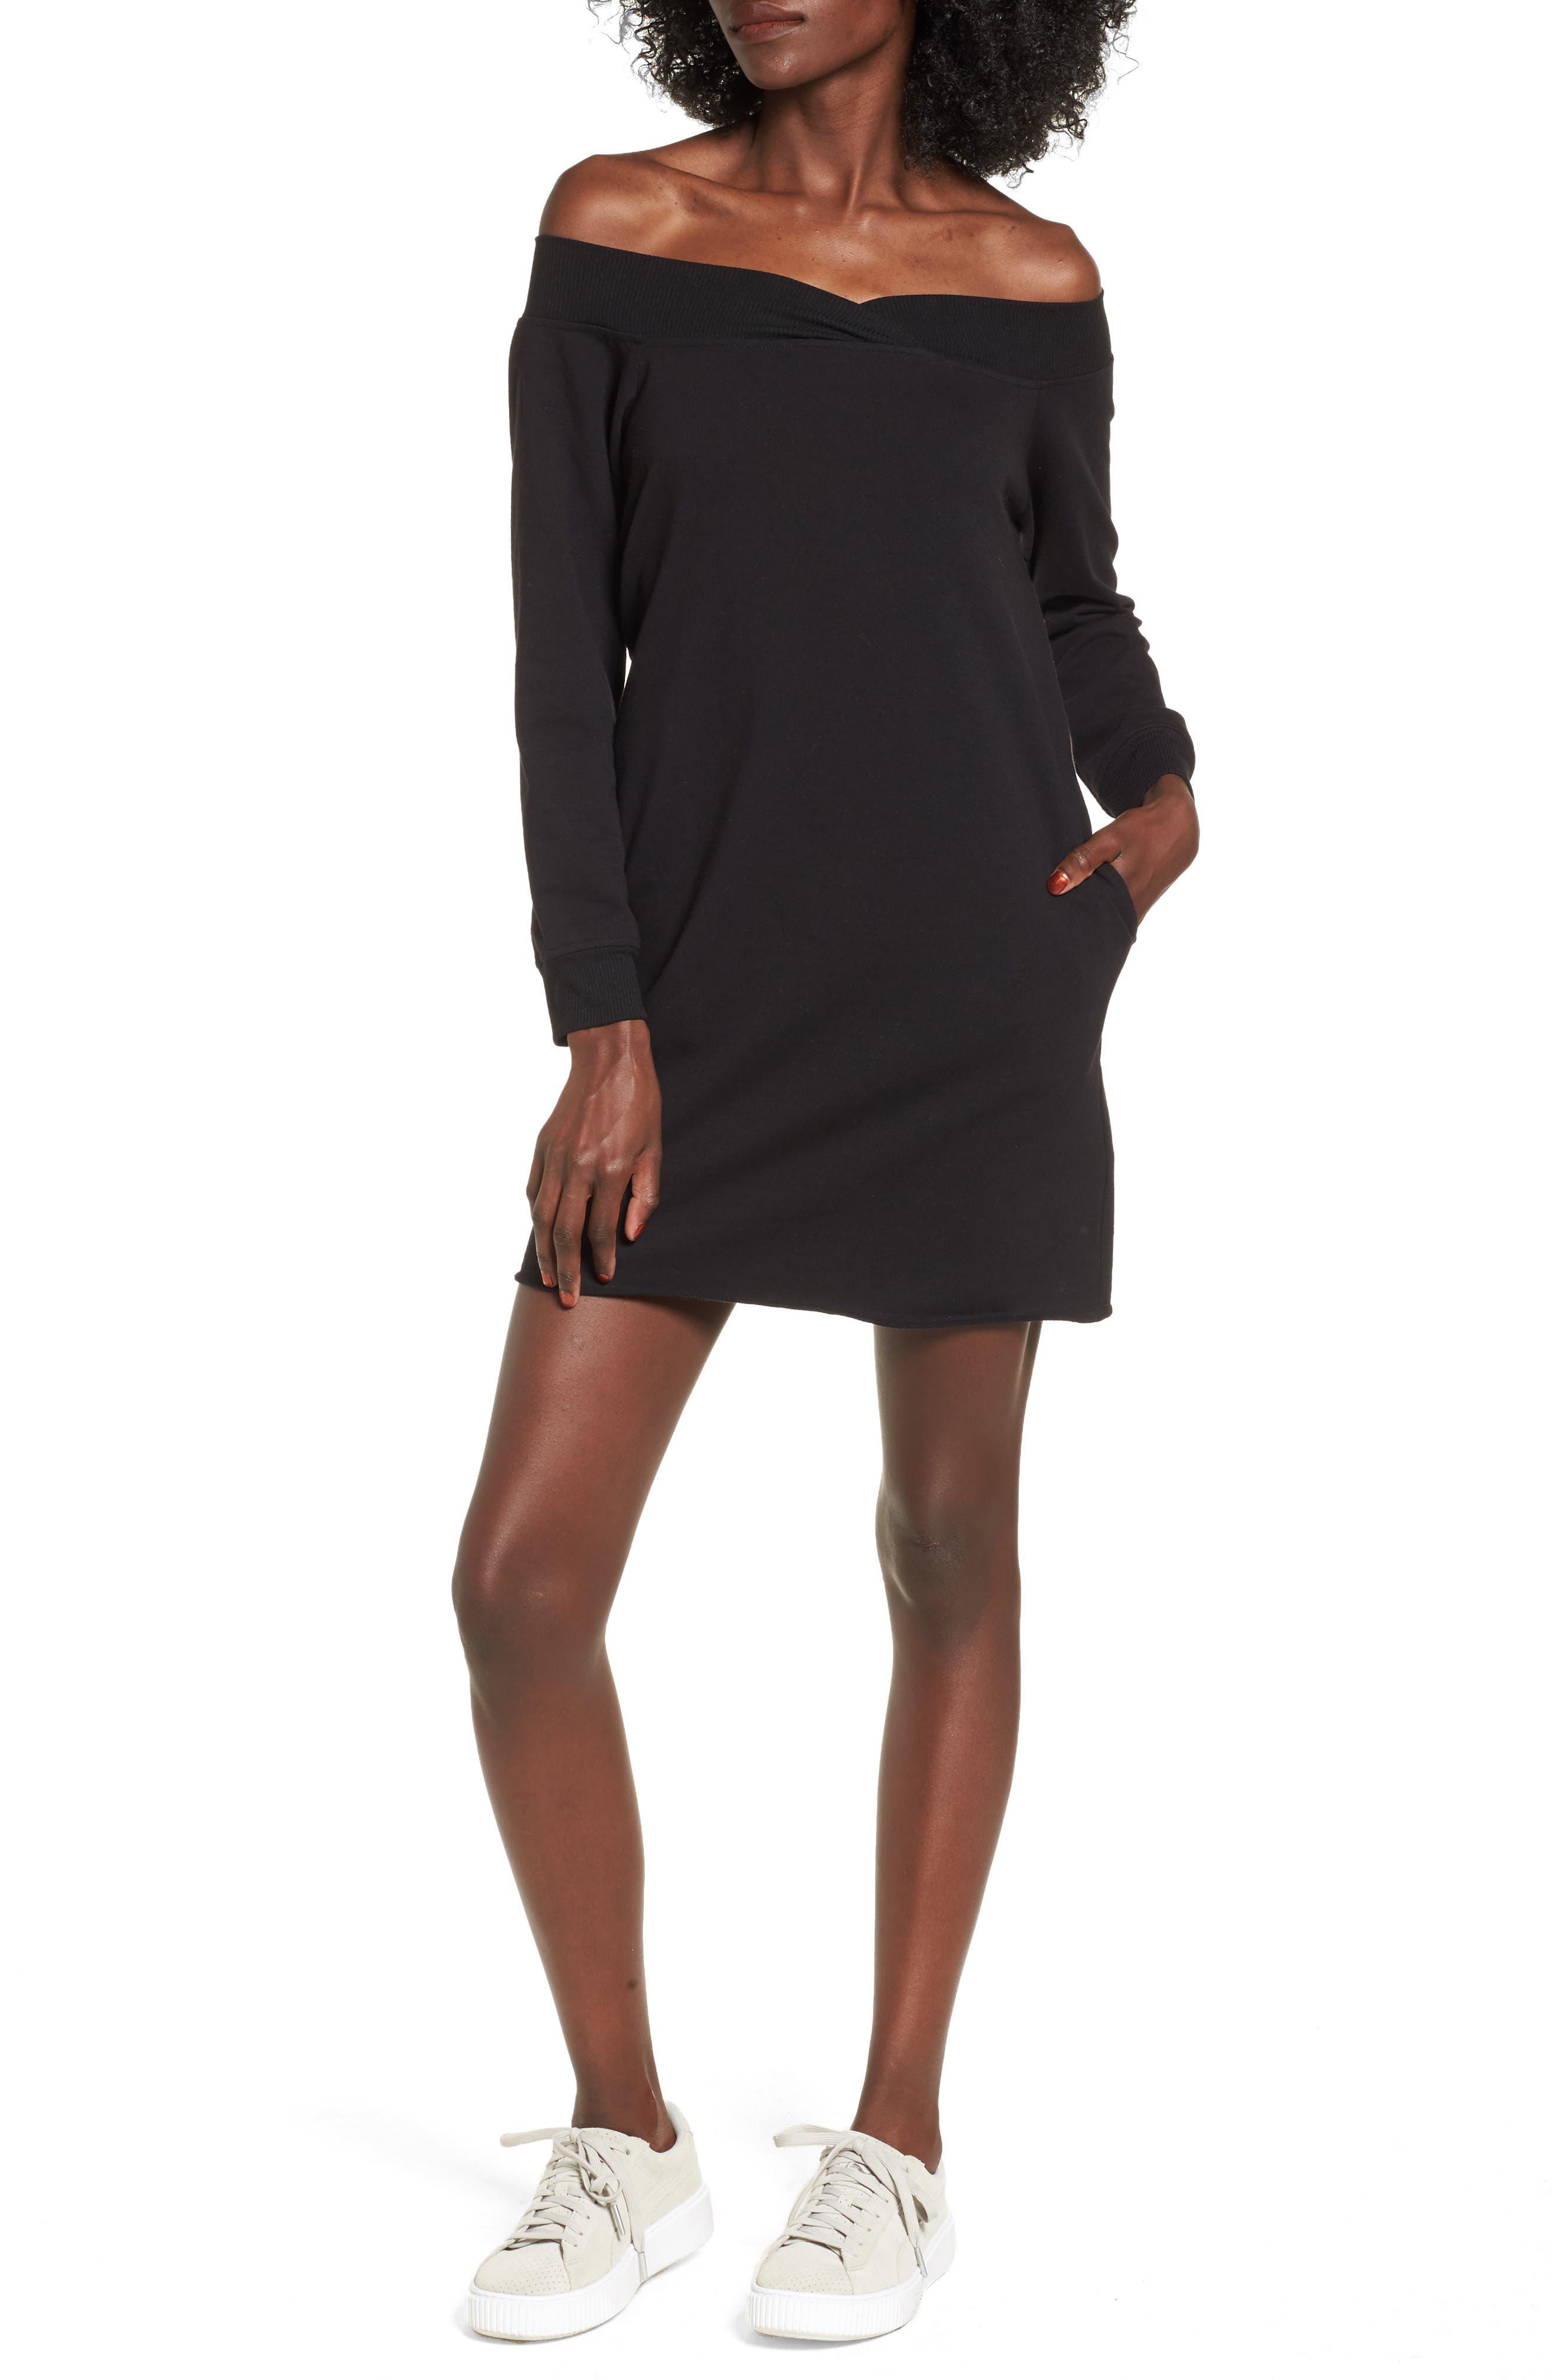 Alternate Image 1 Selected - Socialite Off the Shoulder Sweatshirt Dress